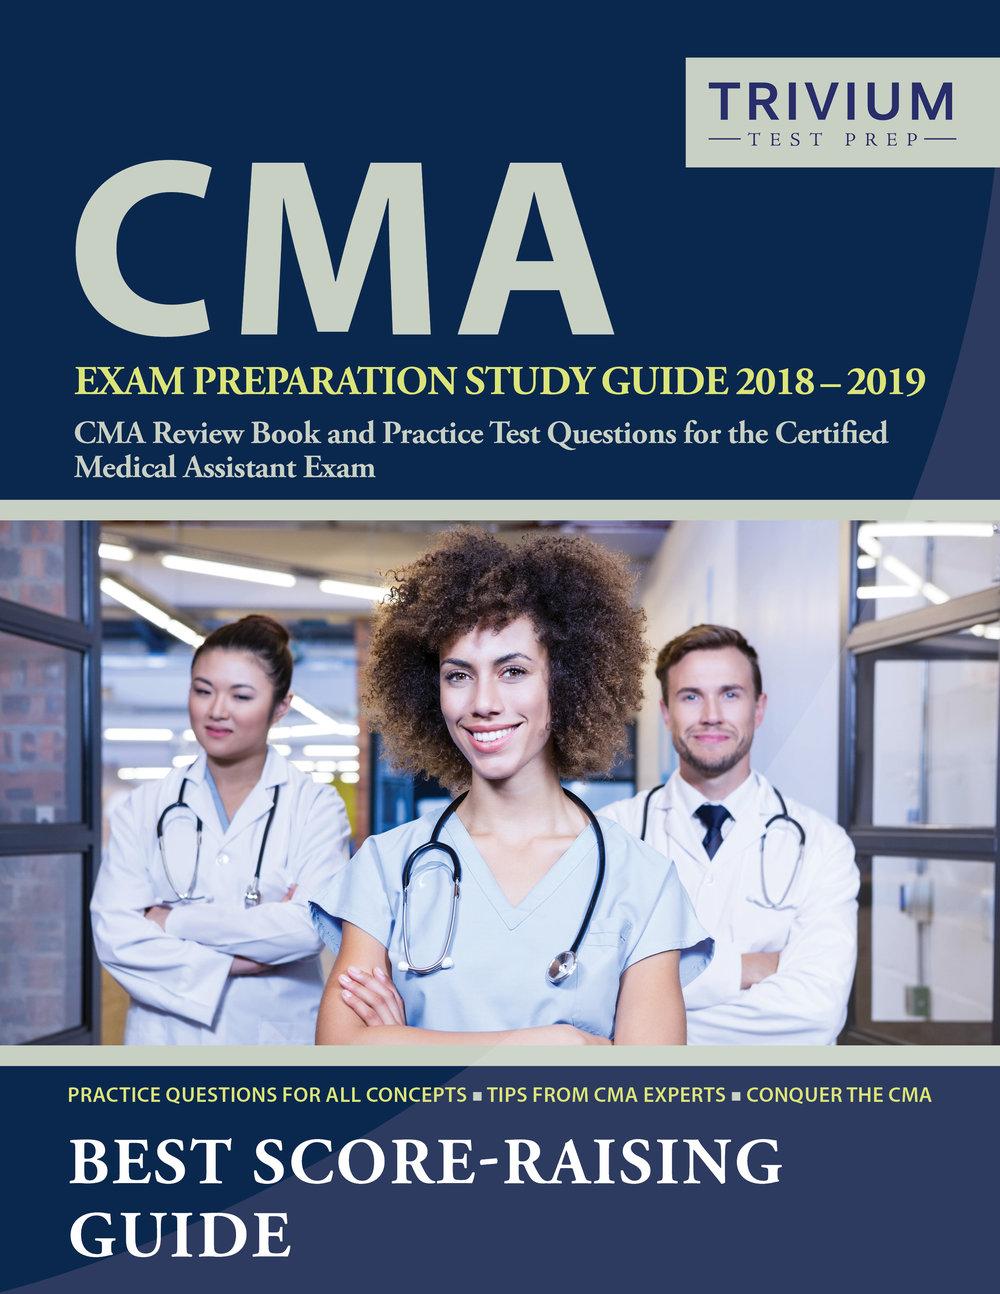 CMA Exam Preparation